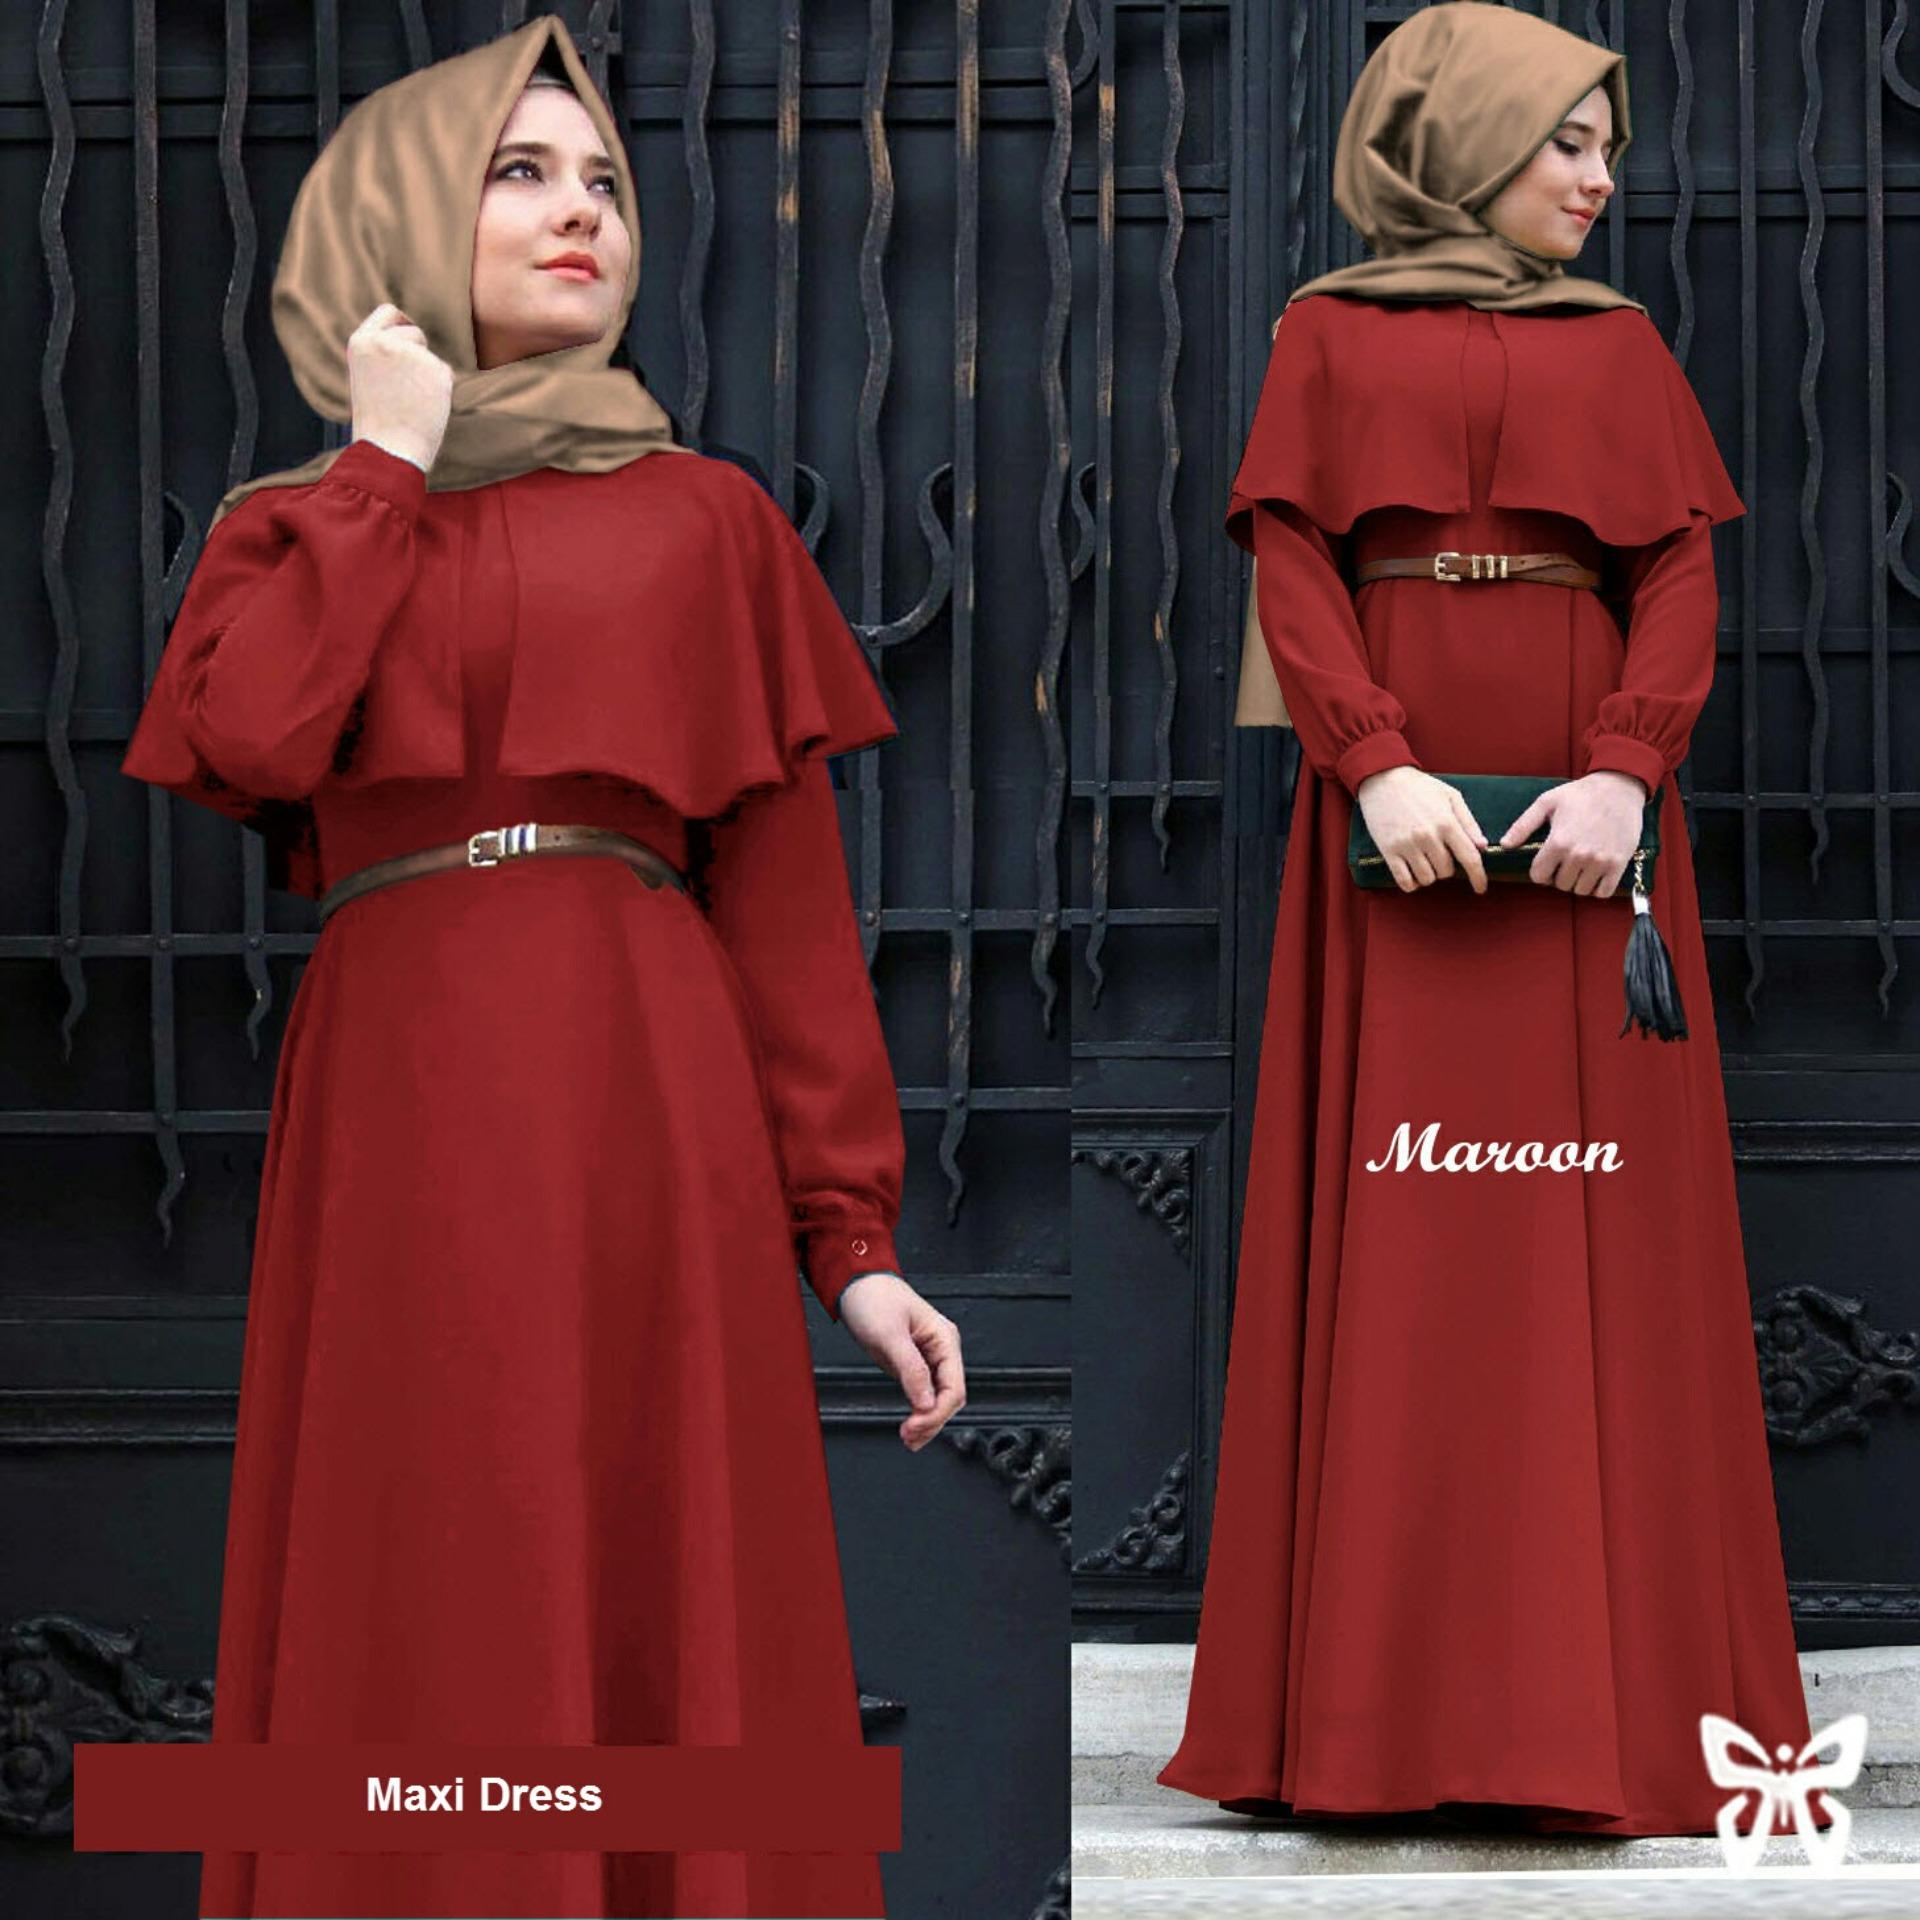 Sera Outfit Maxi Dress Lengan Panjang Set 3 in 1 MSR036 / Gamis Syari / Gaun Pesta Muslimah / Baju Muslim Wanita Syar'i / Hijab / Srclara